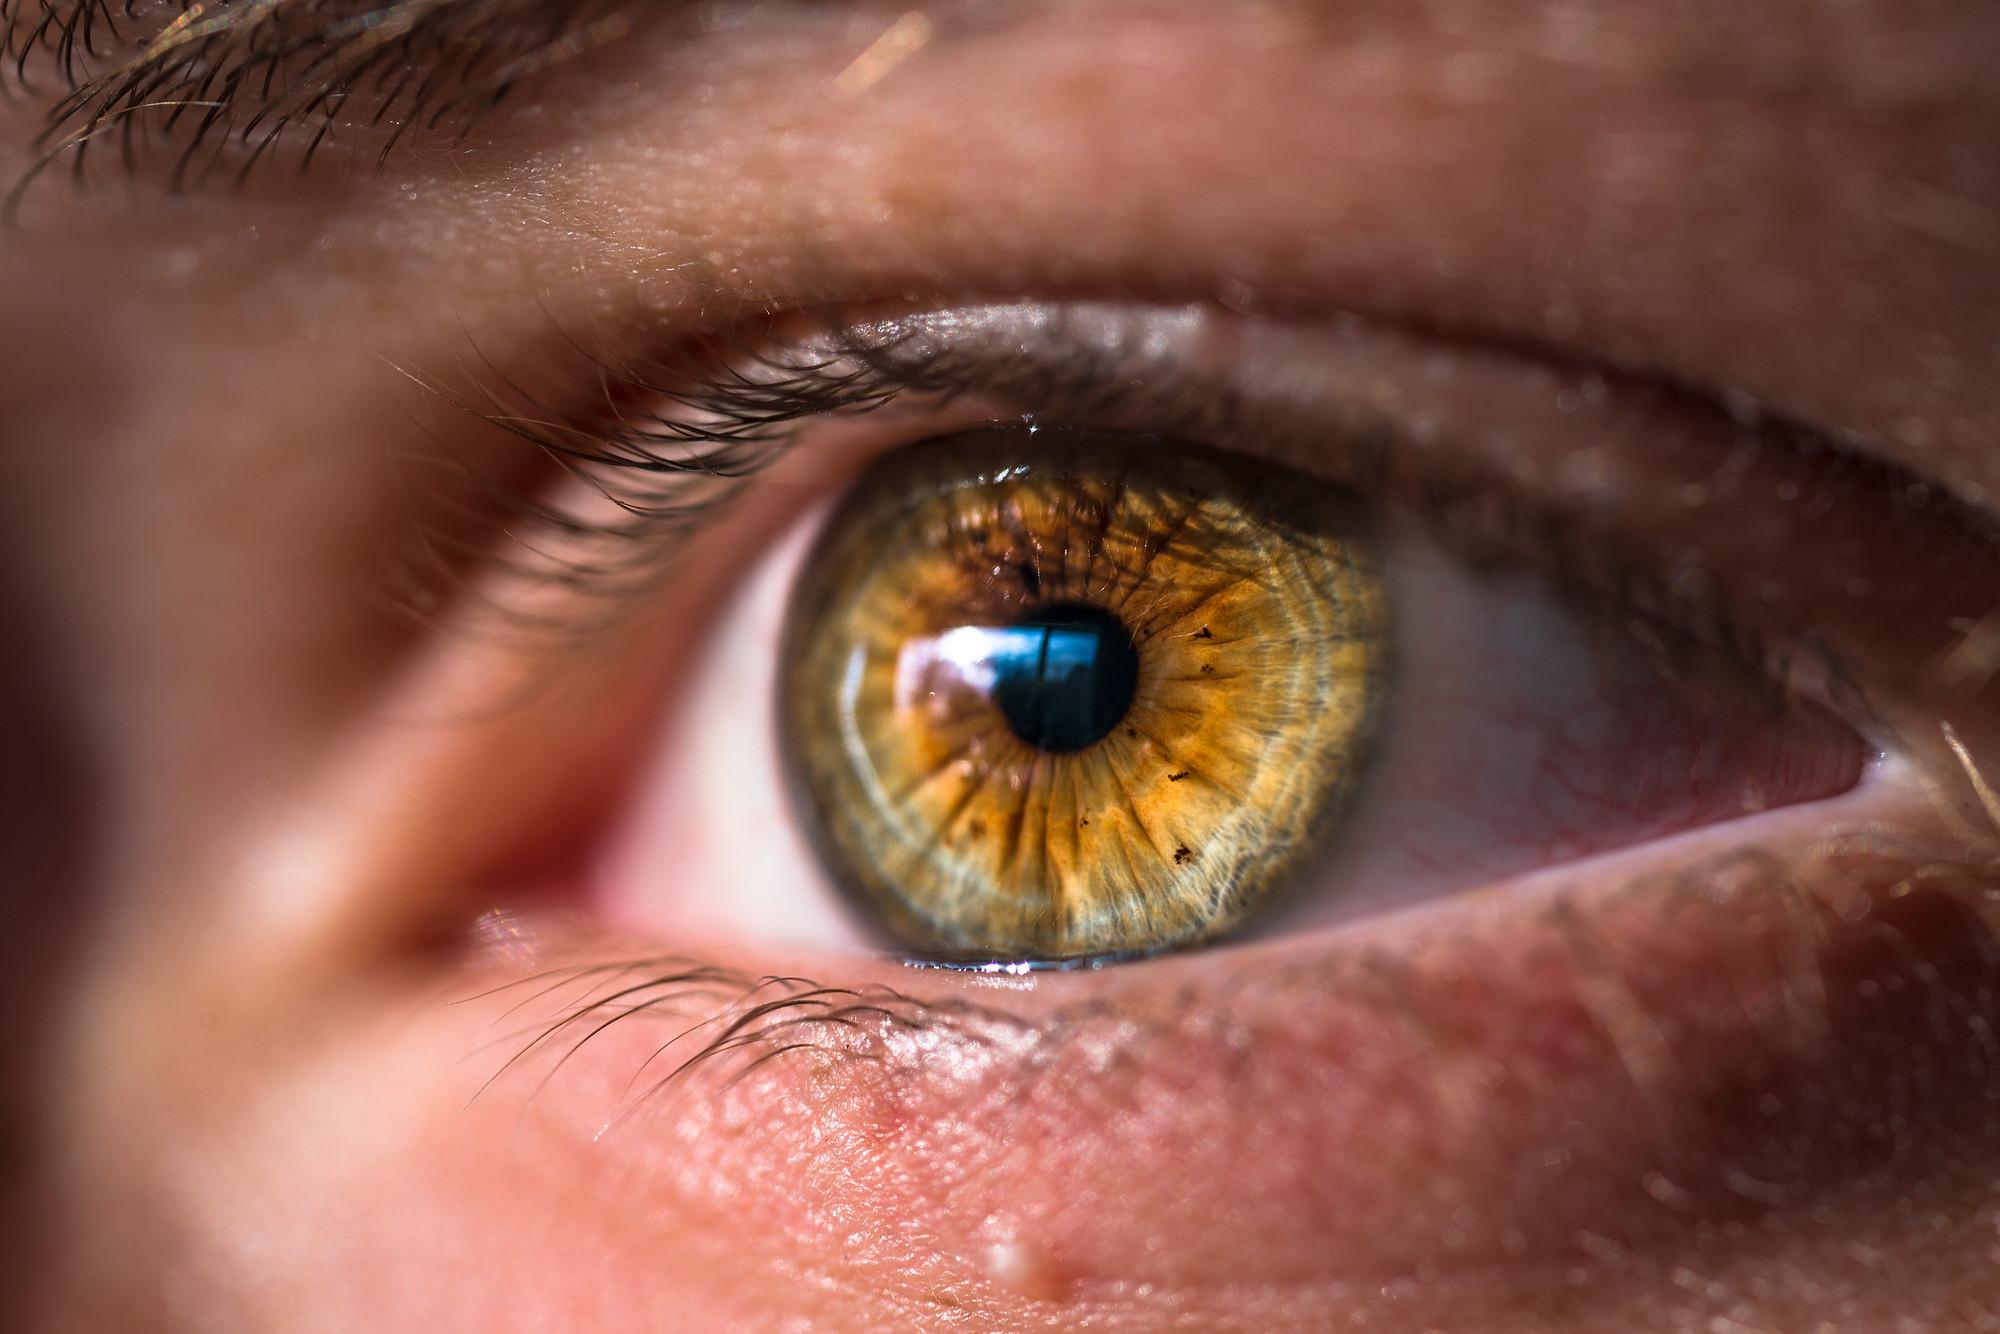 Hazel 7 Rarest and Unusual Eye Colors That Looks Unreal